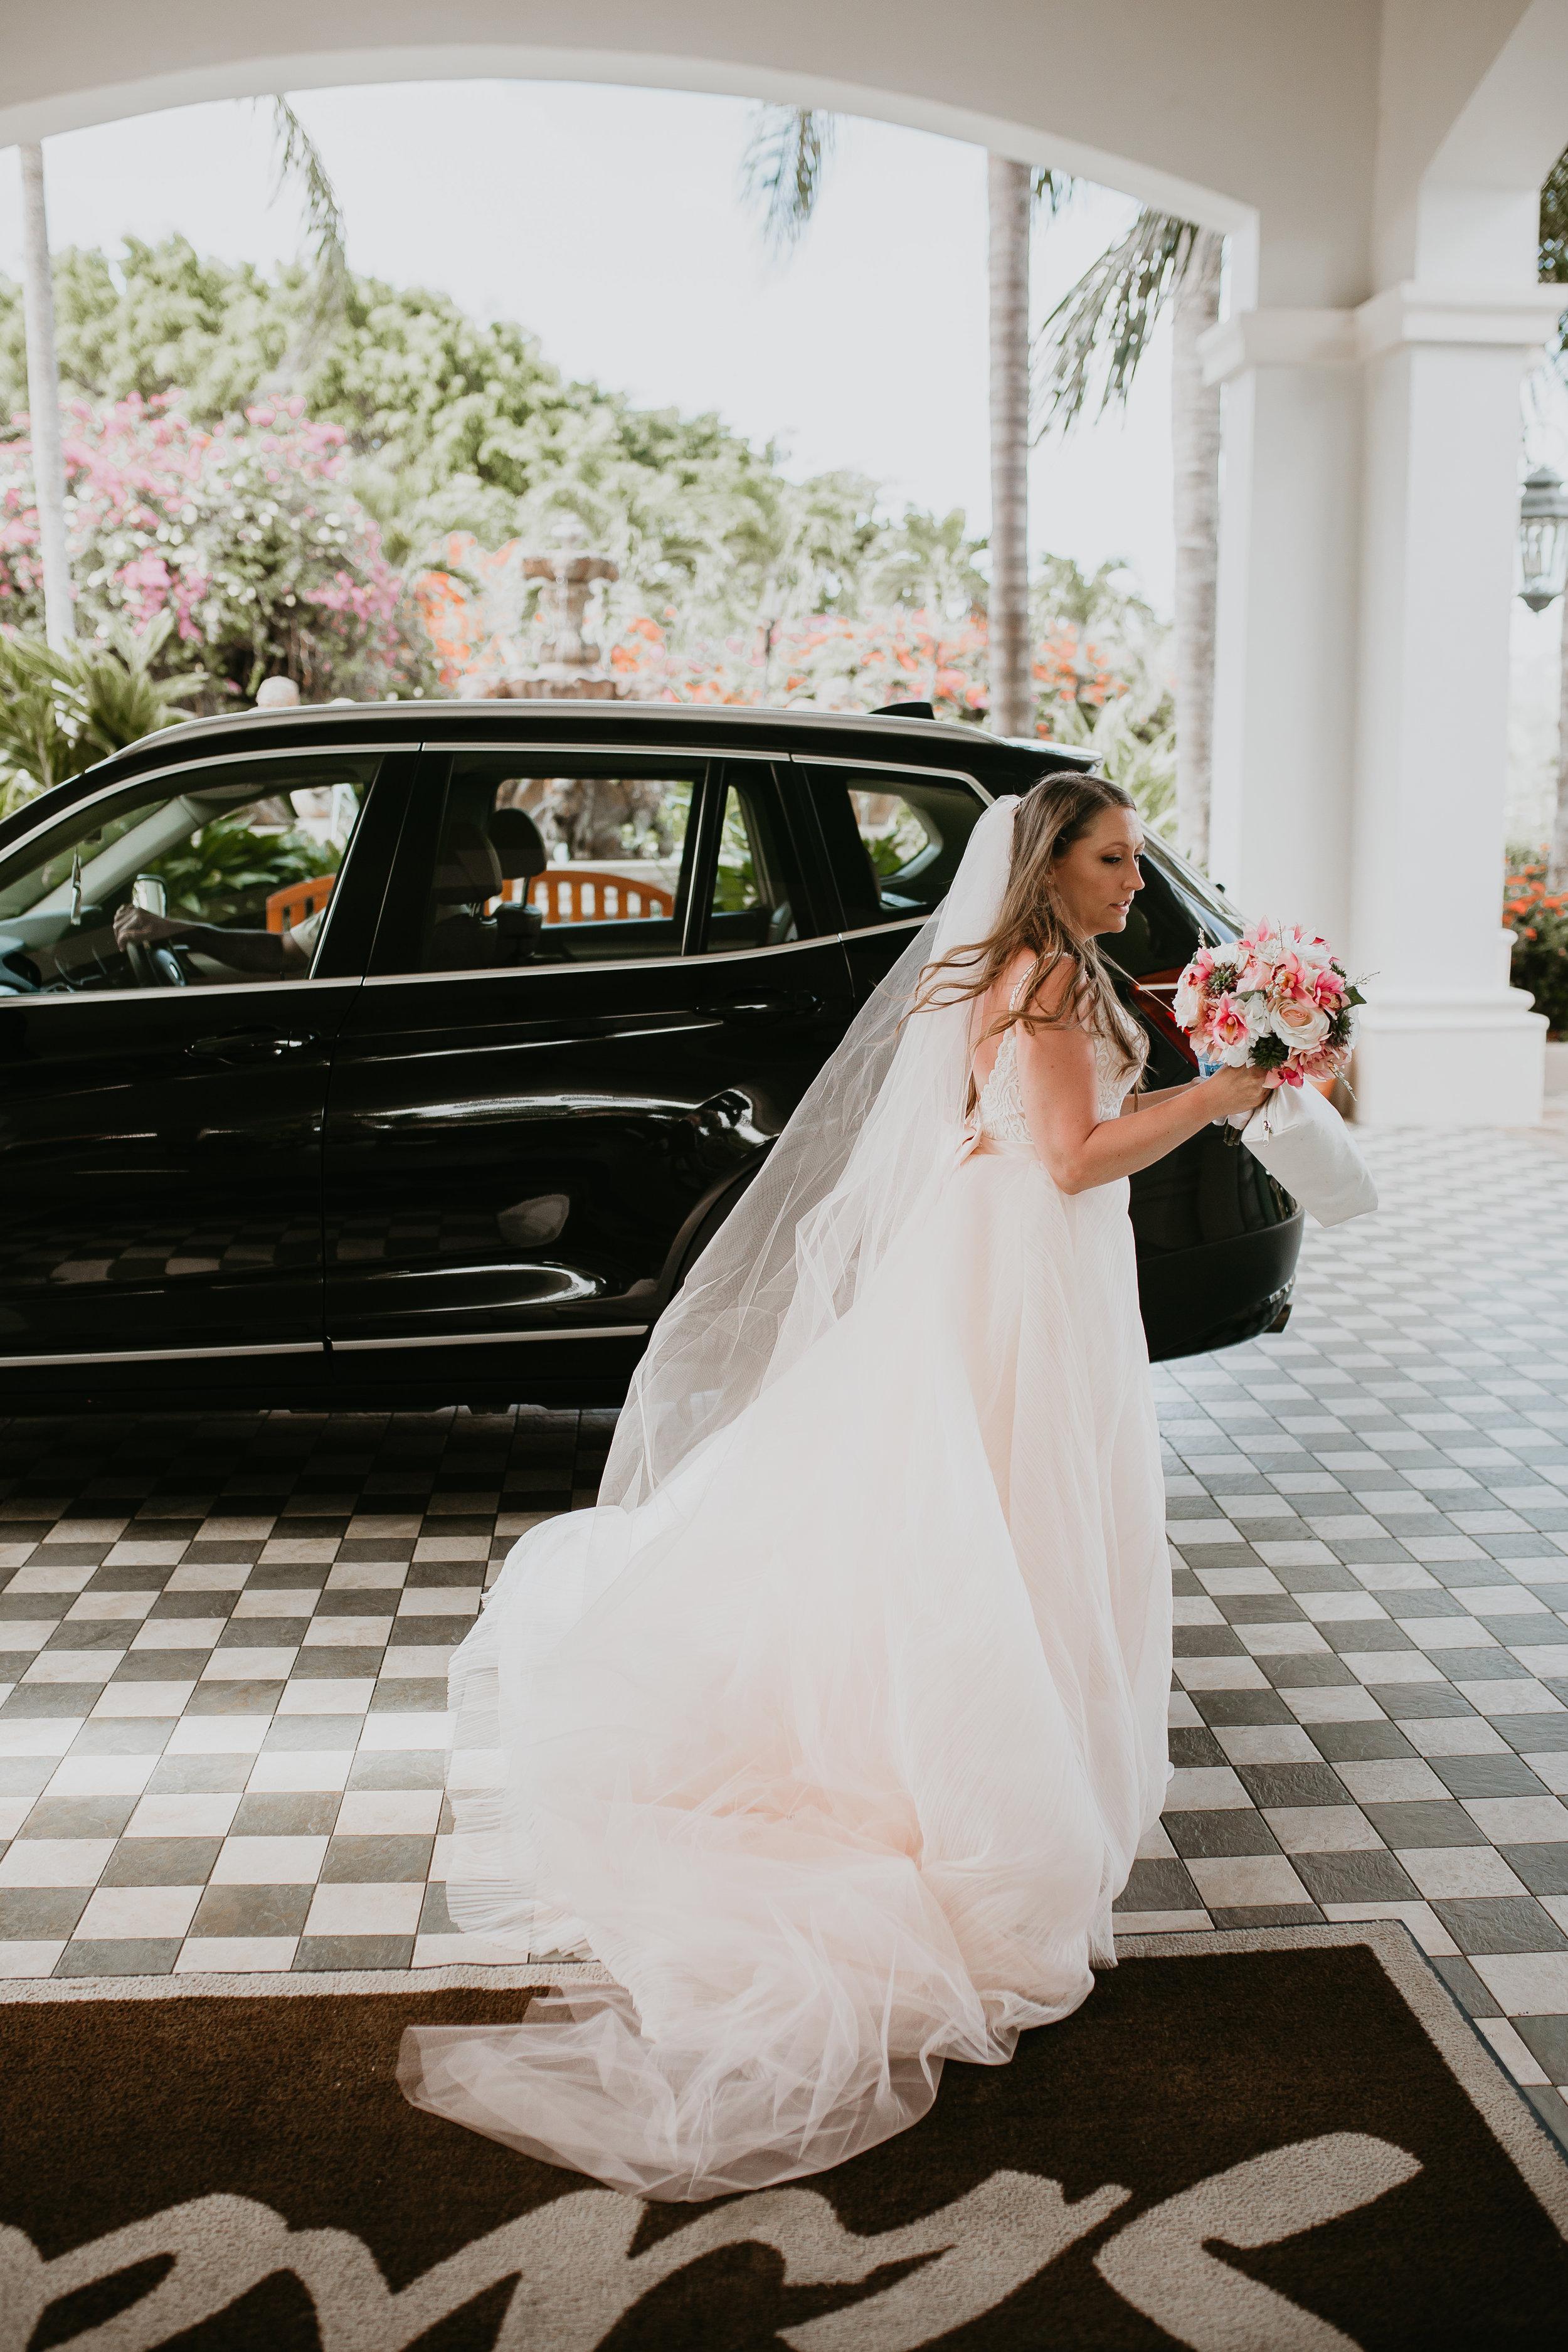 nicole-daacke-photography-destination-wedding-in-st-lucia-sandals-la-toc-intimate-island-wedding-carribean-elopement-photographer-chill-island-wedding-27.jpg